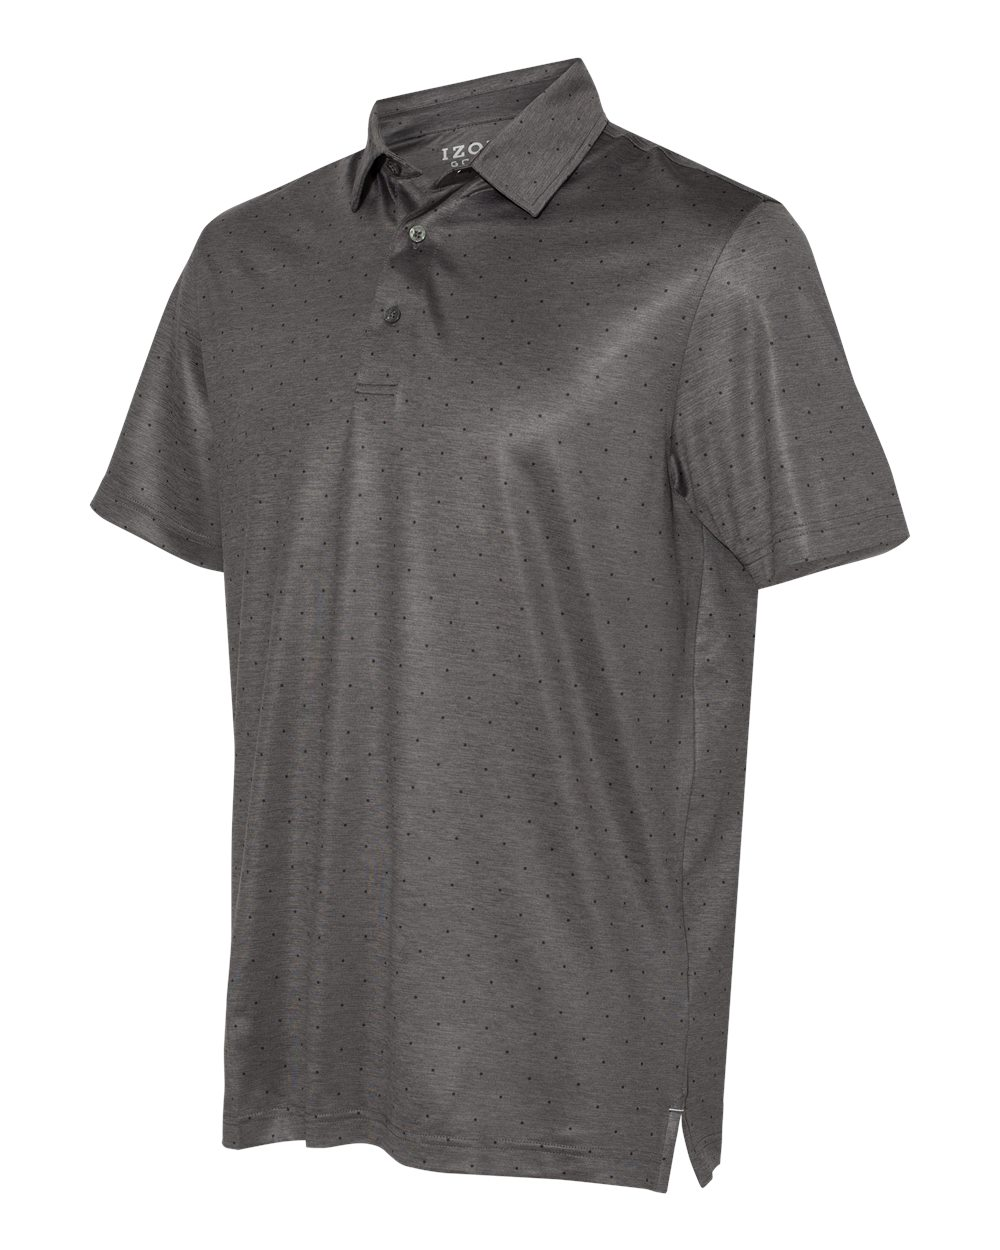 IZOD 13GG003 - Polka Dot Sport Shirt